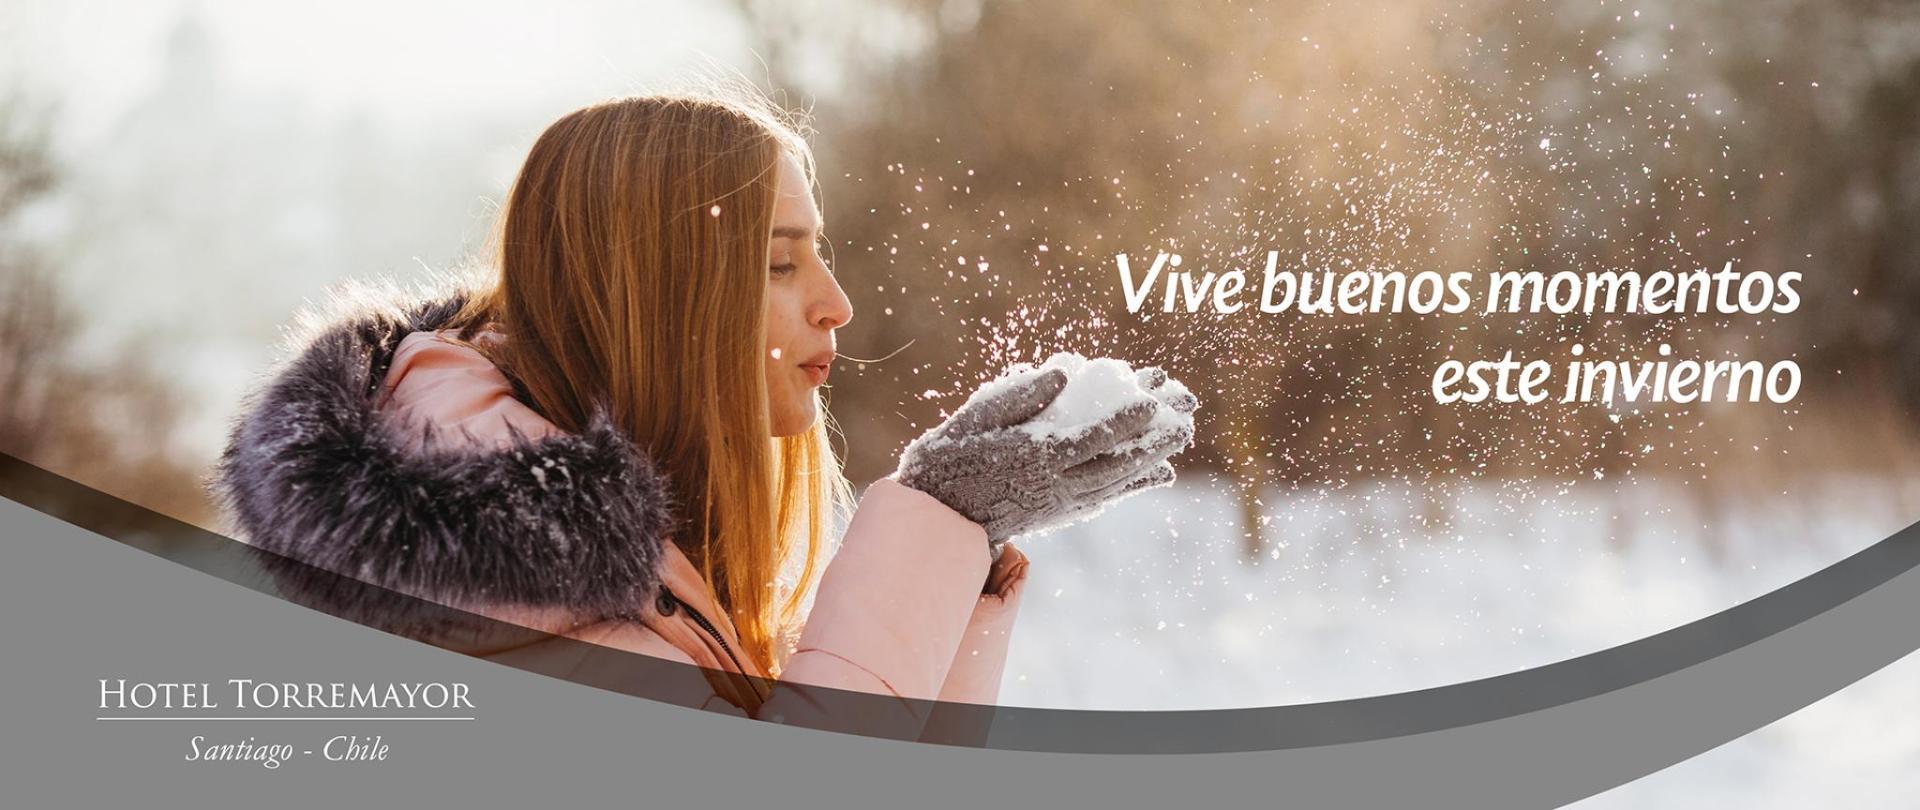 invierno-05.jpg